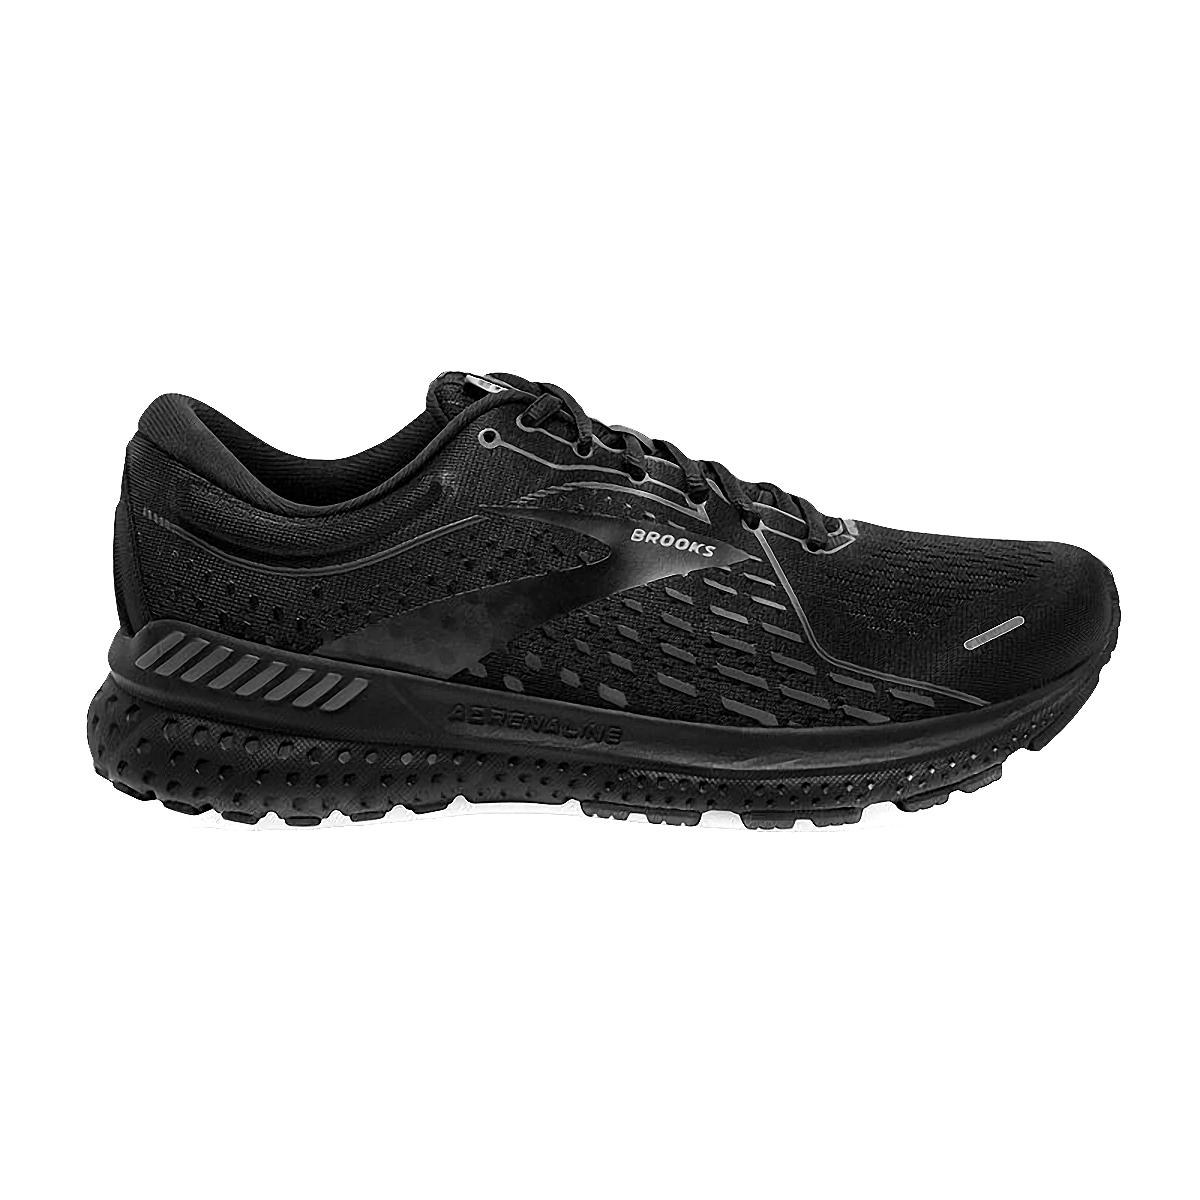 Men's Brooks Adrenaline GTS 21 Running Shoe - Color: Black/Black/Ebony - Size: 7 - Width: Regular, Black/Black/Ebony, large, image 1